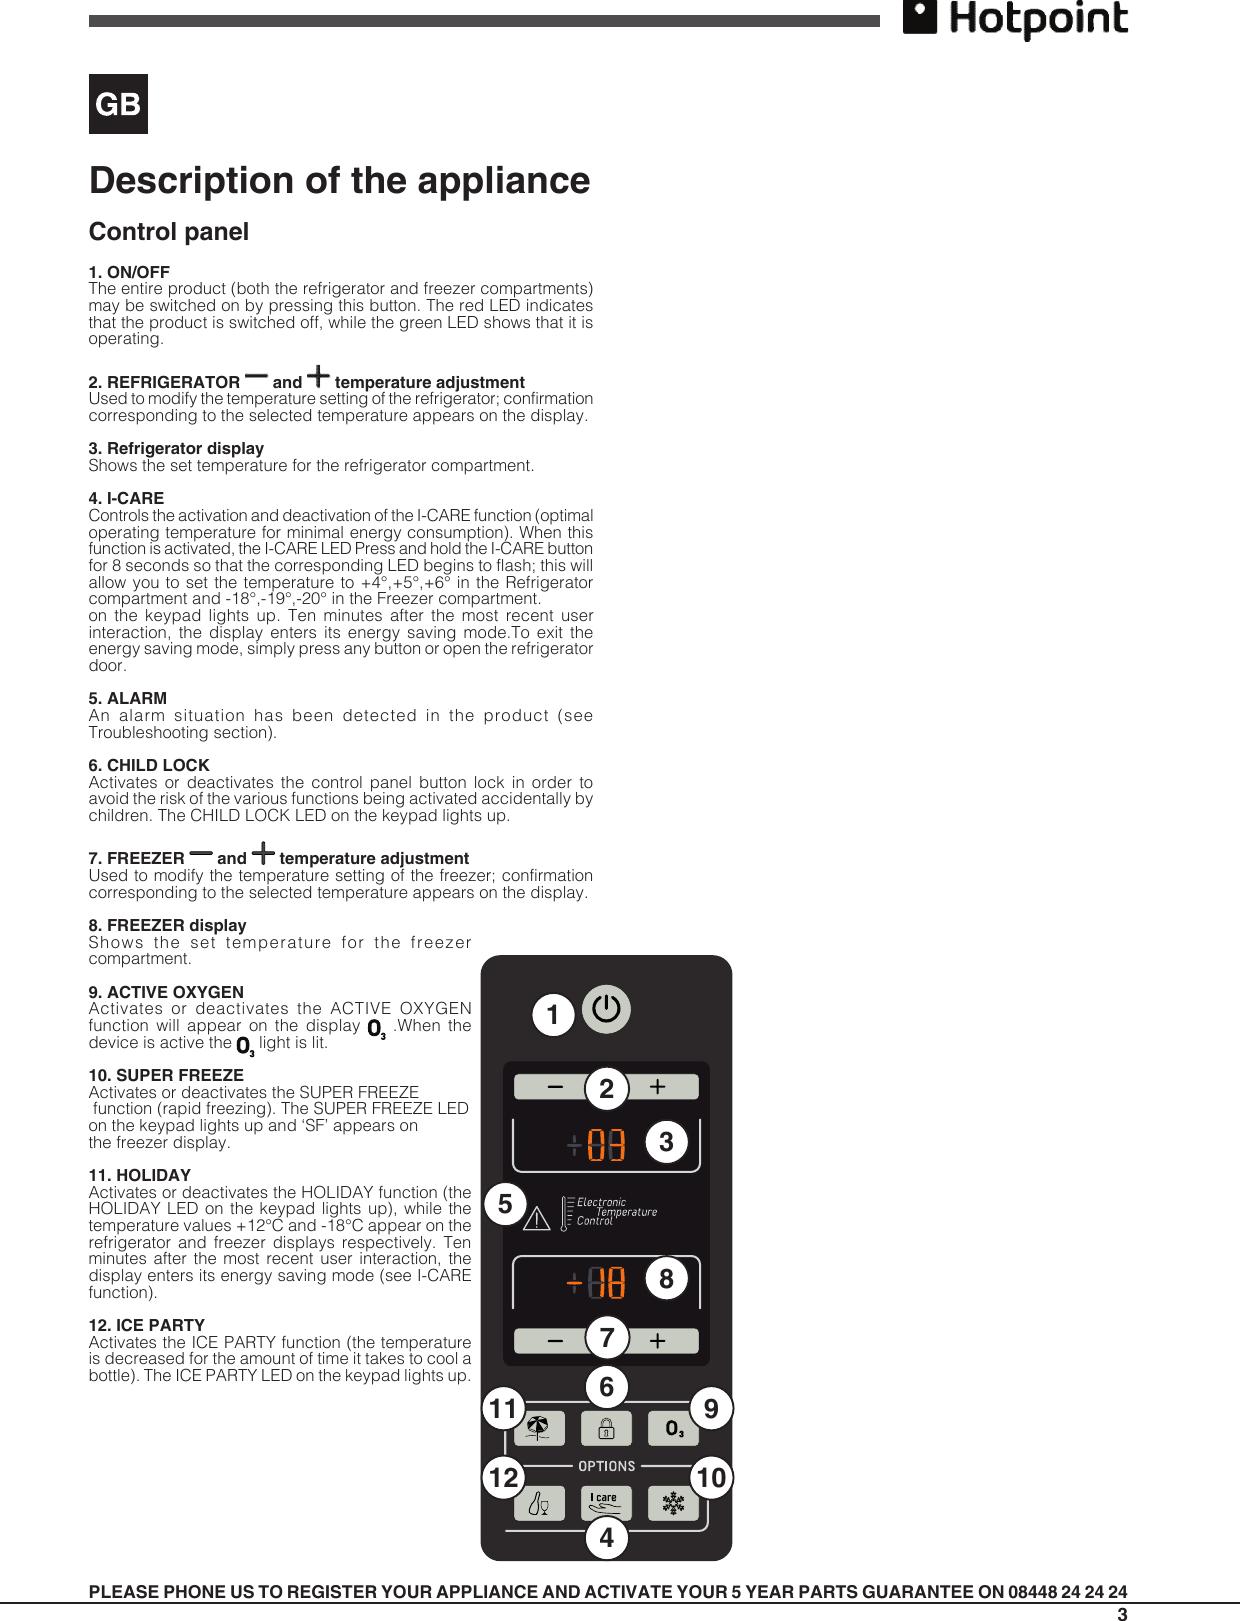 hotpoint zer refrigerator user manual free owners manual u2022 rh wordworksbysea com User Guides Samples iPad Manual